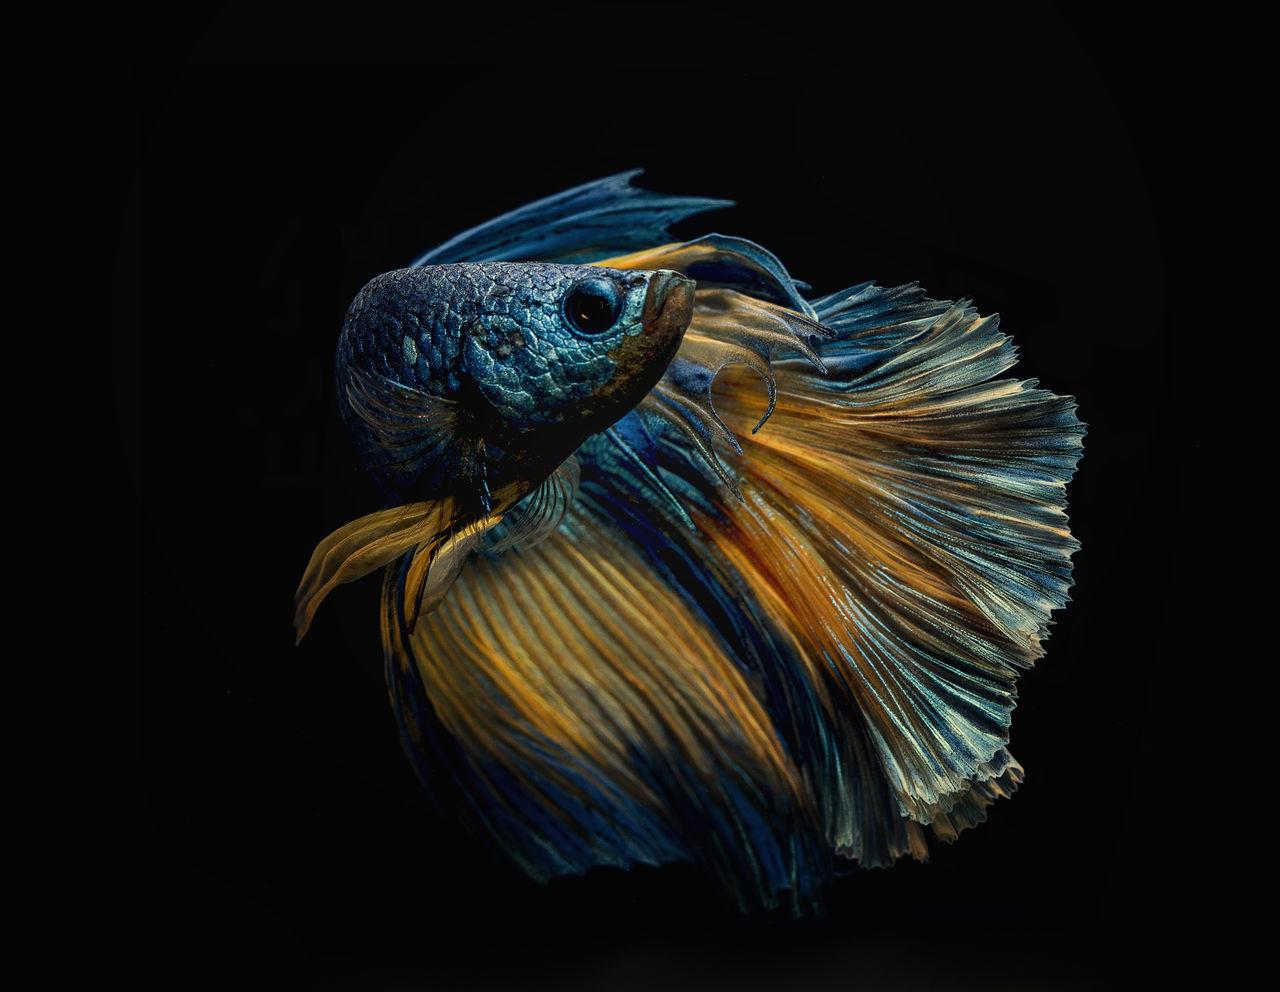 black background, one animal, studio shot, animal themes, animal wildlife, no people, bird, animals in the wild, close-up, blue, night, nature, outdoors